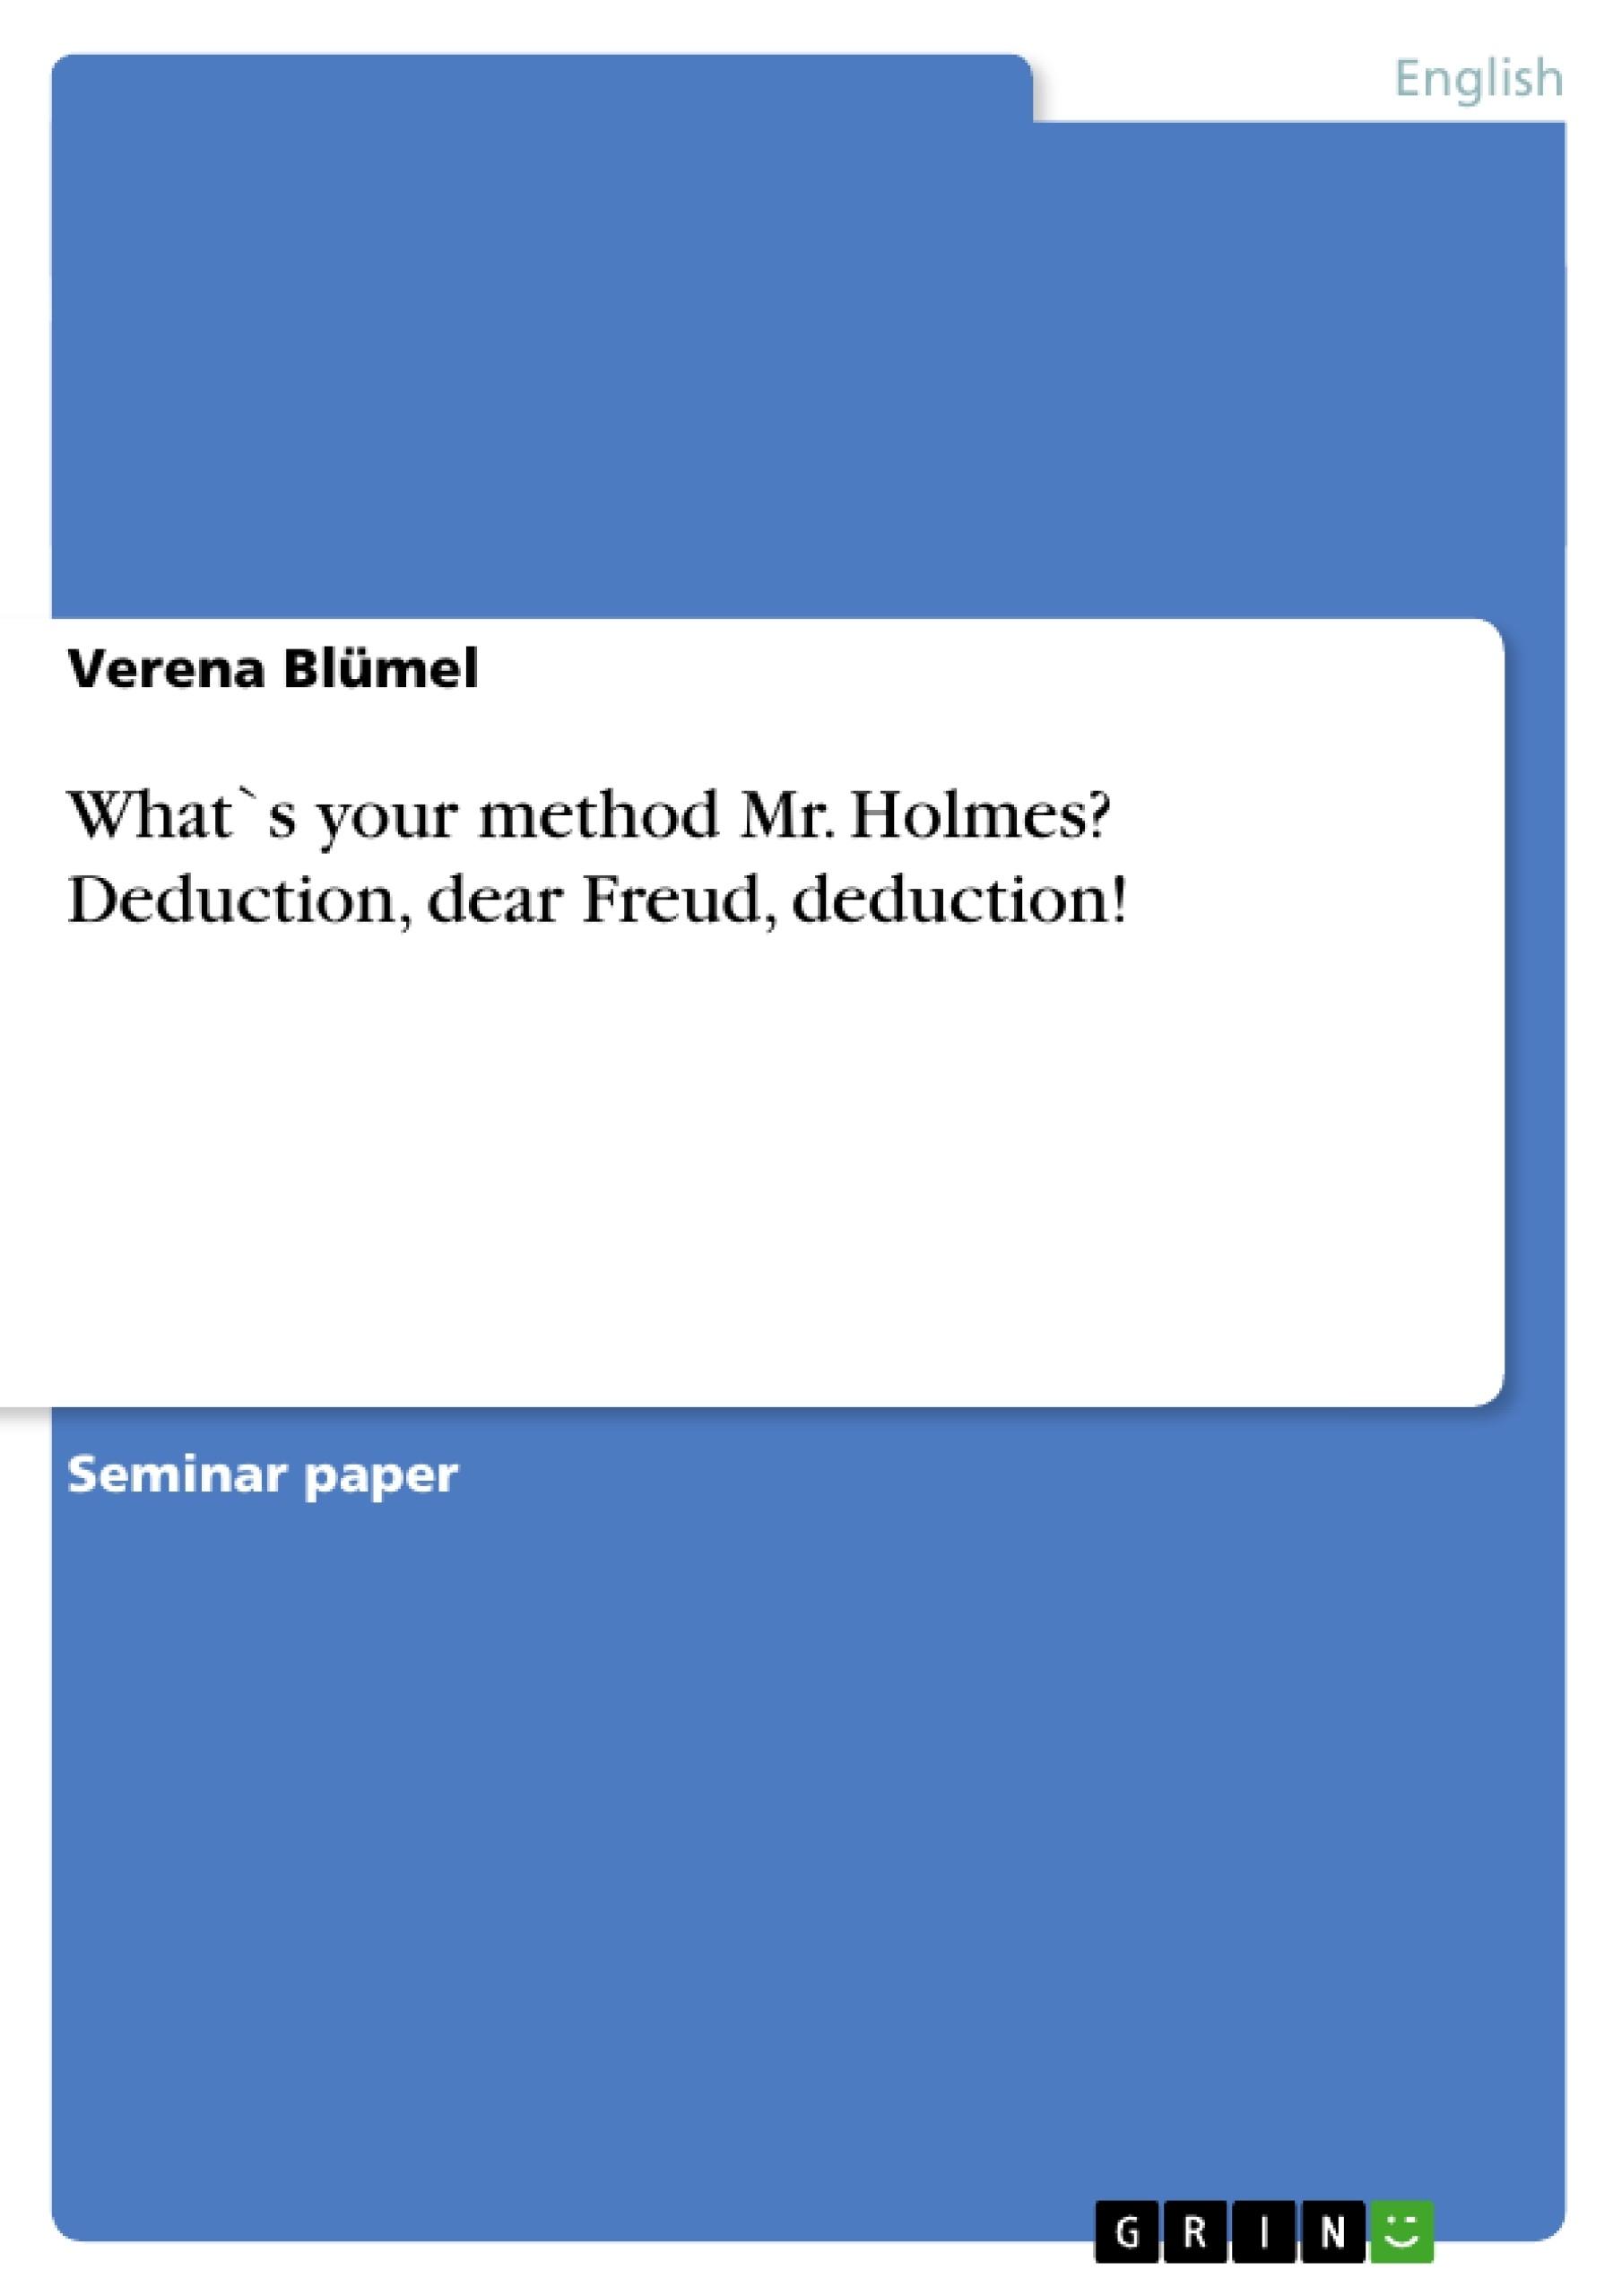 Title: What`s your method Mr. Holmes? Deduction, dear Freud, deduction!